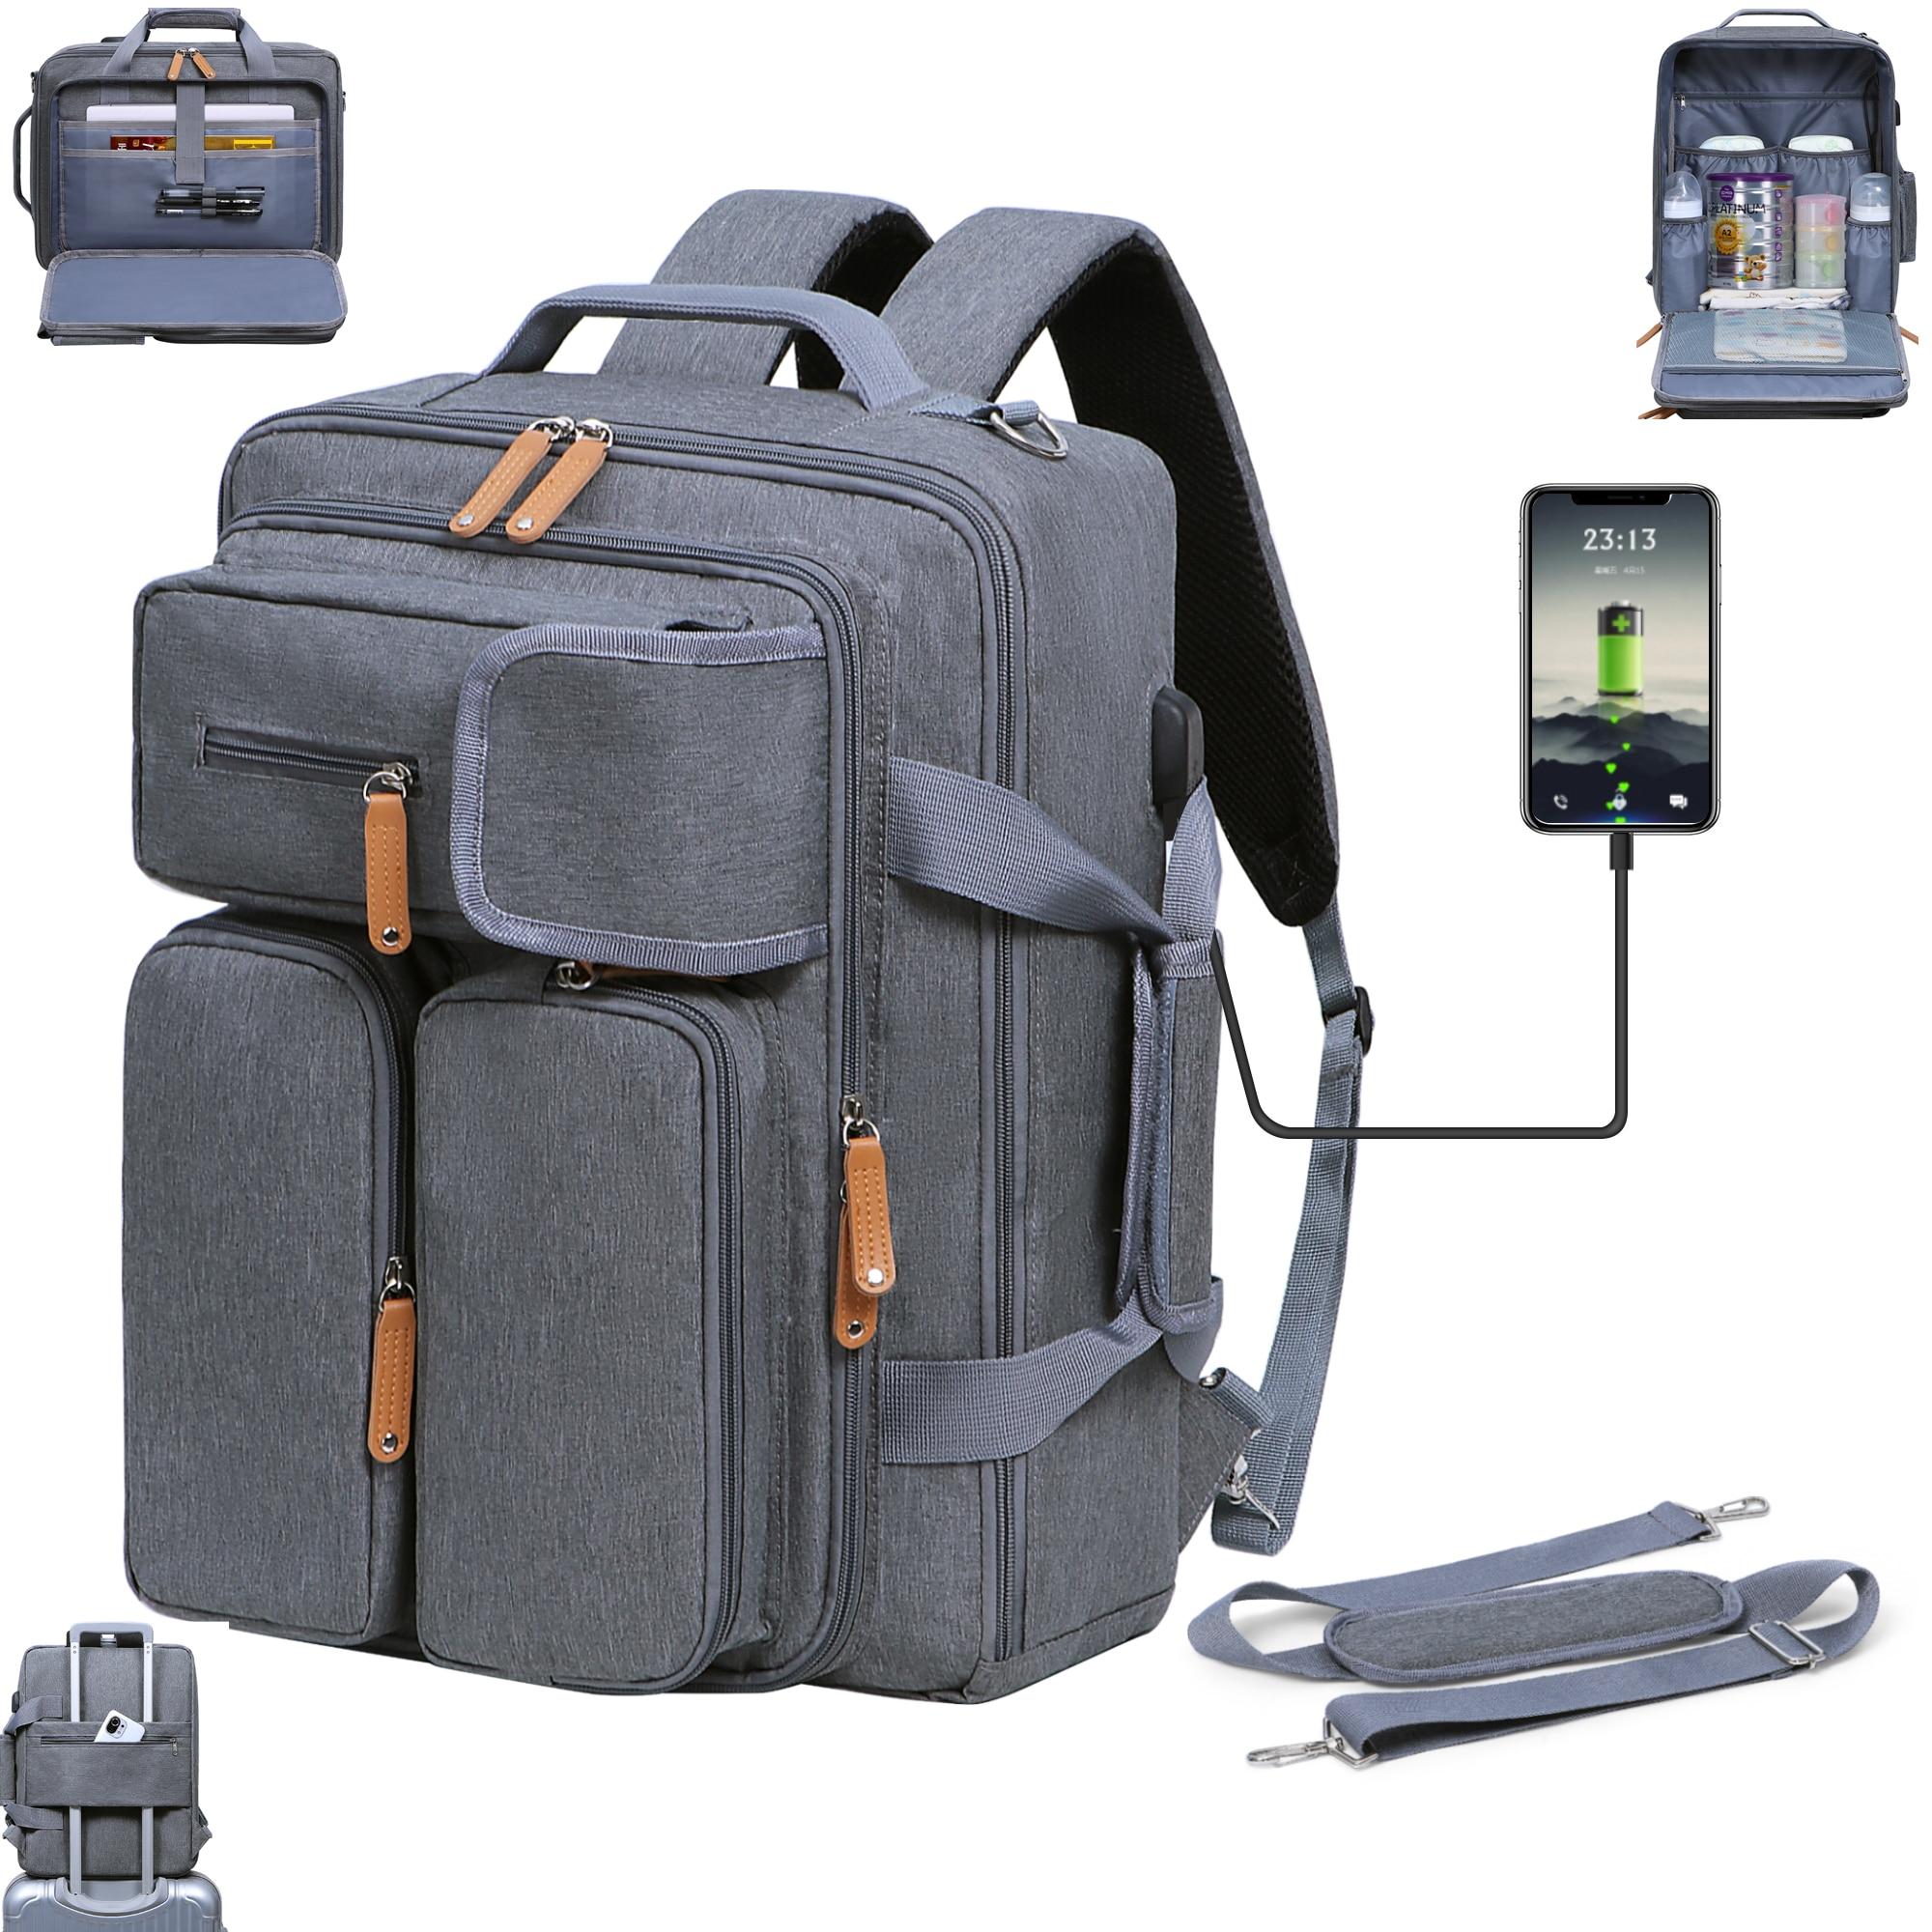 2021 Travel Women Backpack For Baby Care Large Capacity Mummy Nursing Backpacks Portable Daddy Mother Tote Bag Shoulder Handbag недорого